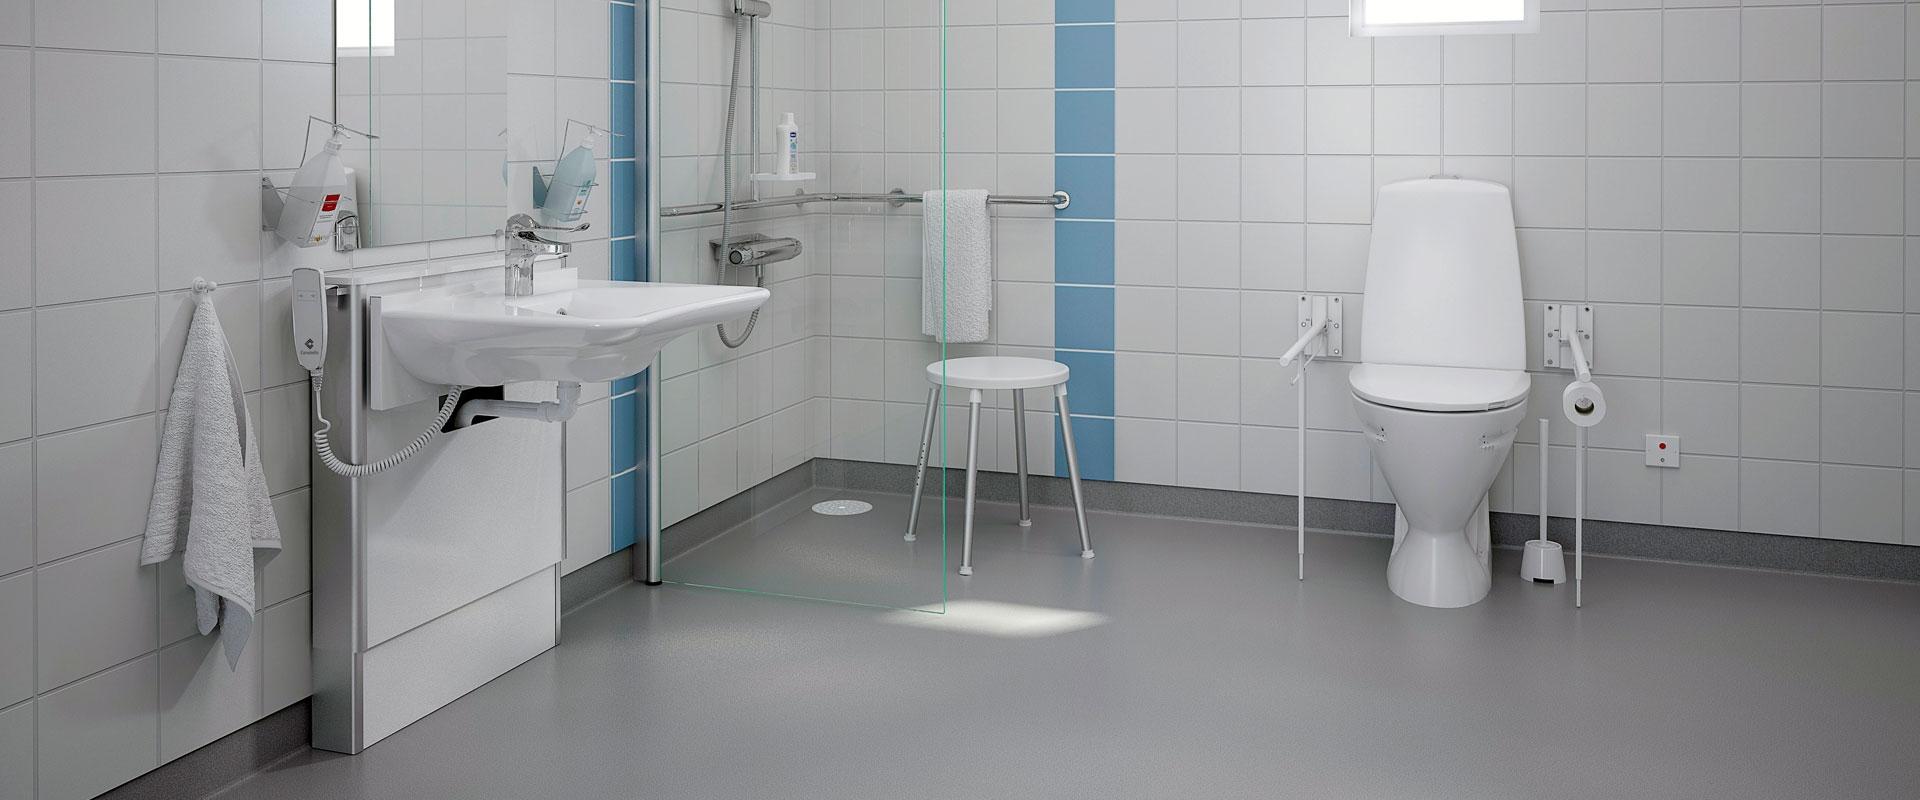 Inspiration Tvättställ